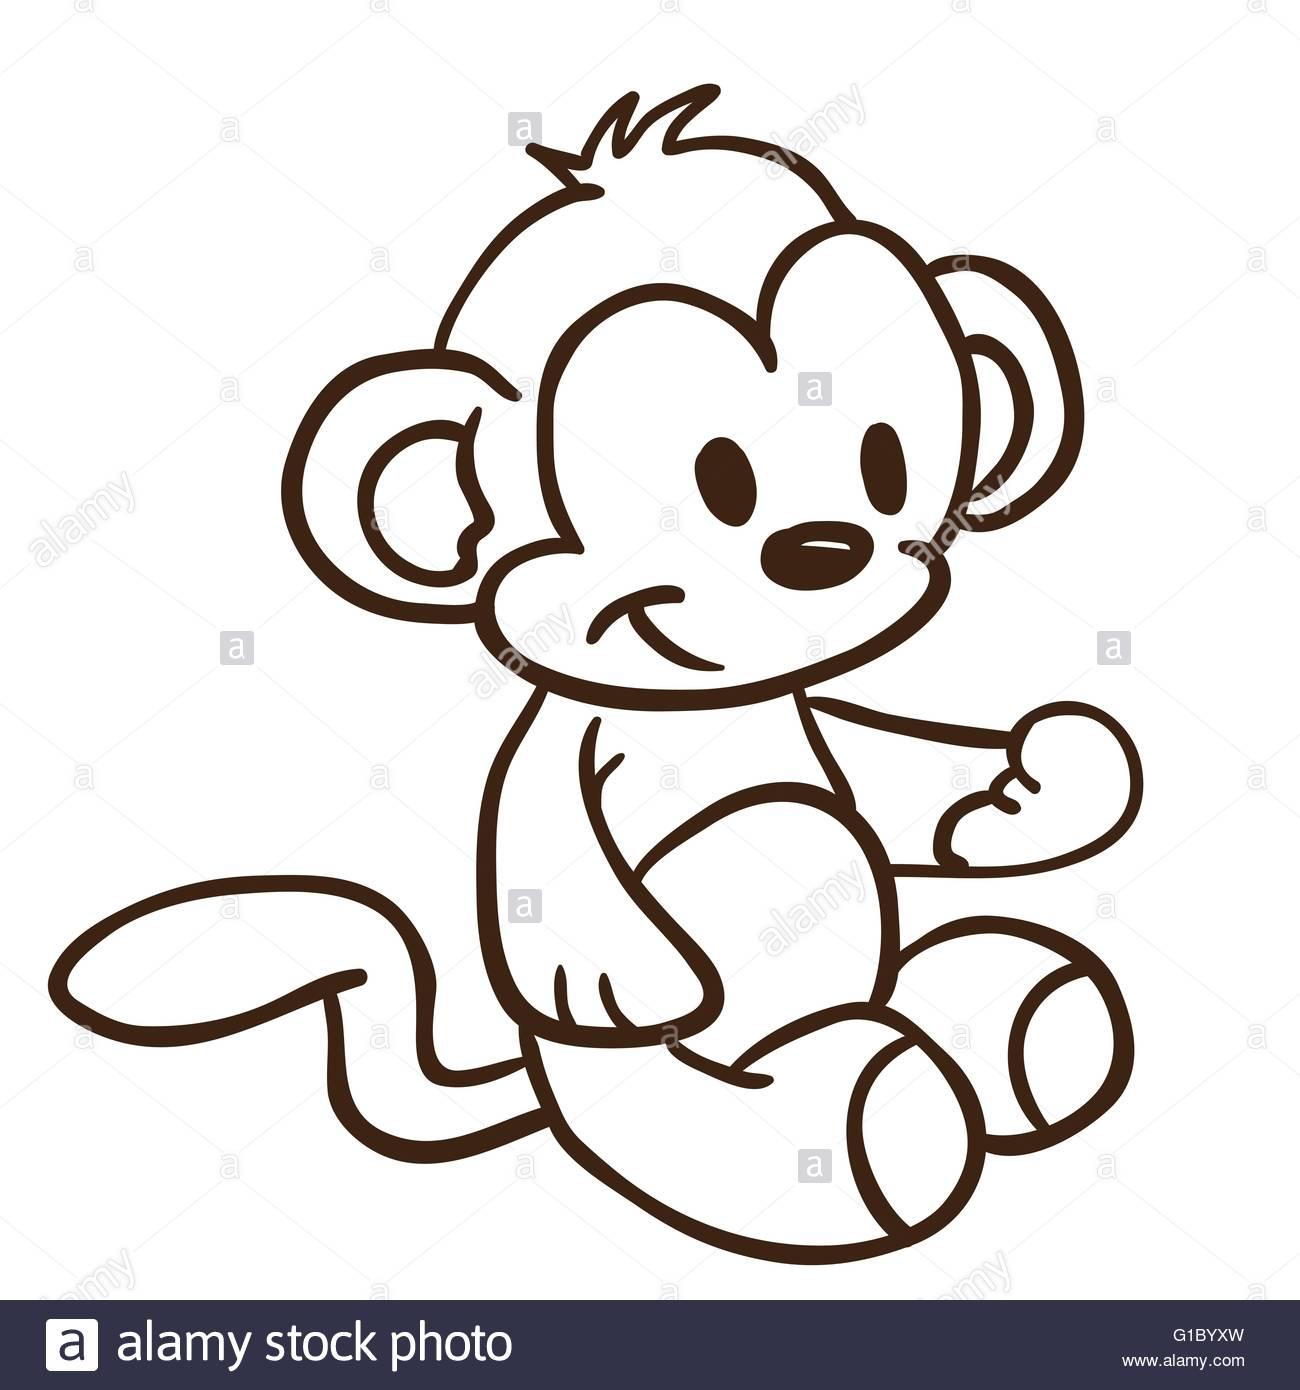 1300x1390 Simple Black And White Monkey Cartoon Stock Vector Art